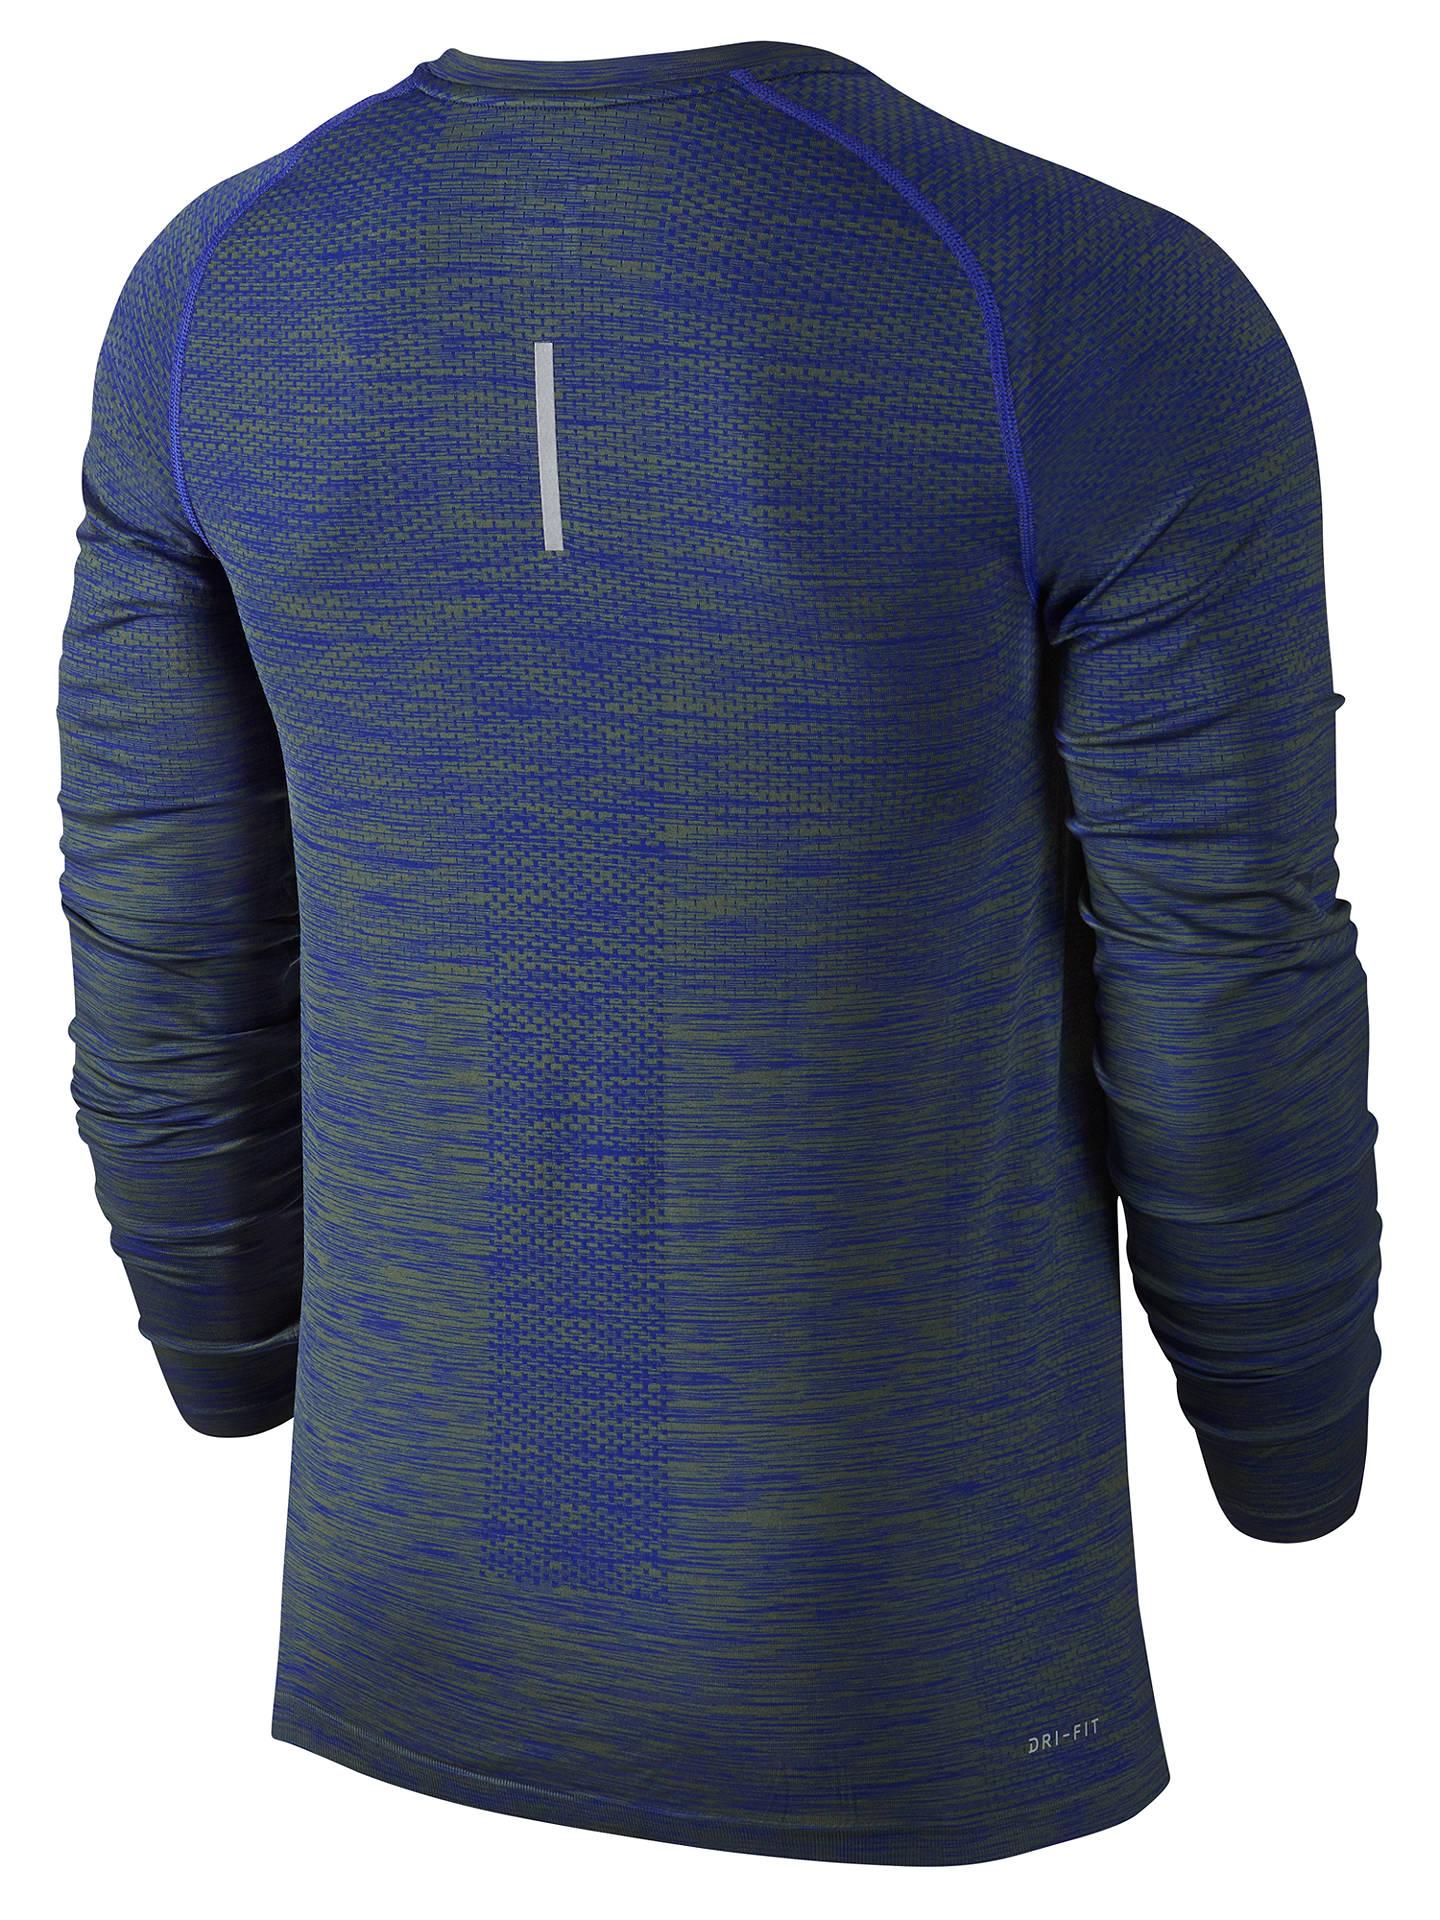 df29aa49 ... Buy Nike Dri-FIT Knit Long Sleeve Running Top, Paramount Blue/Palm Green